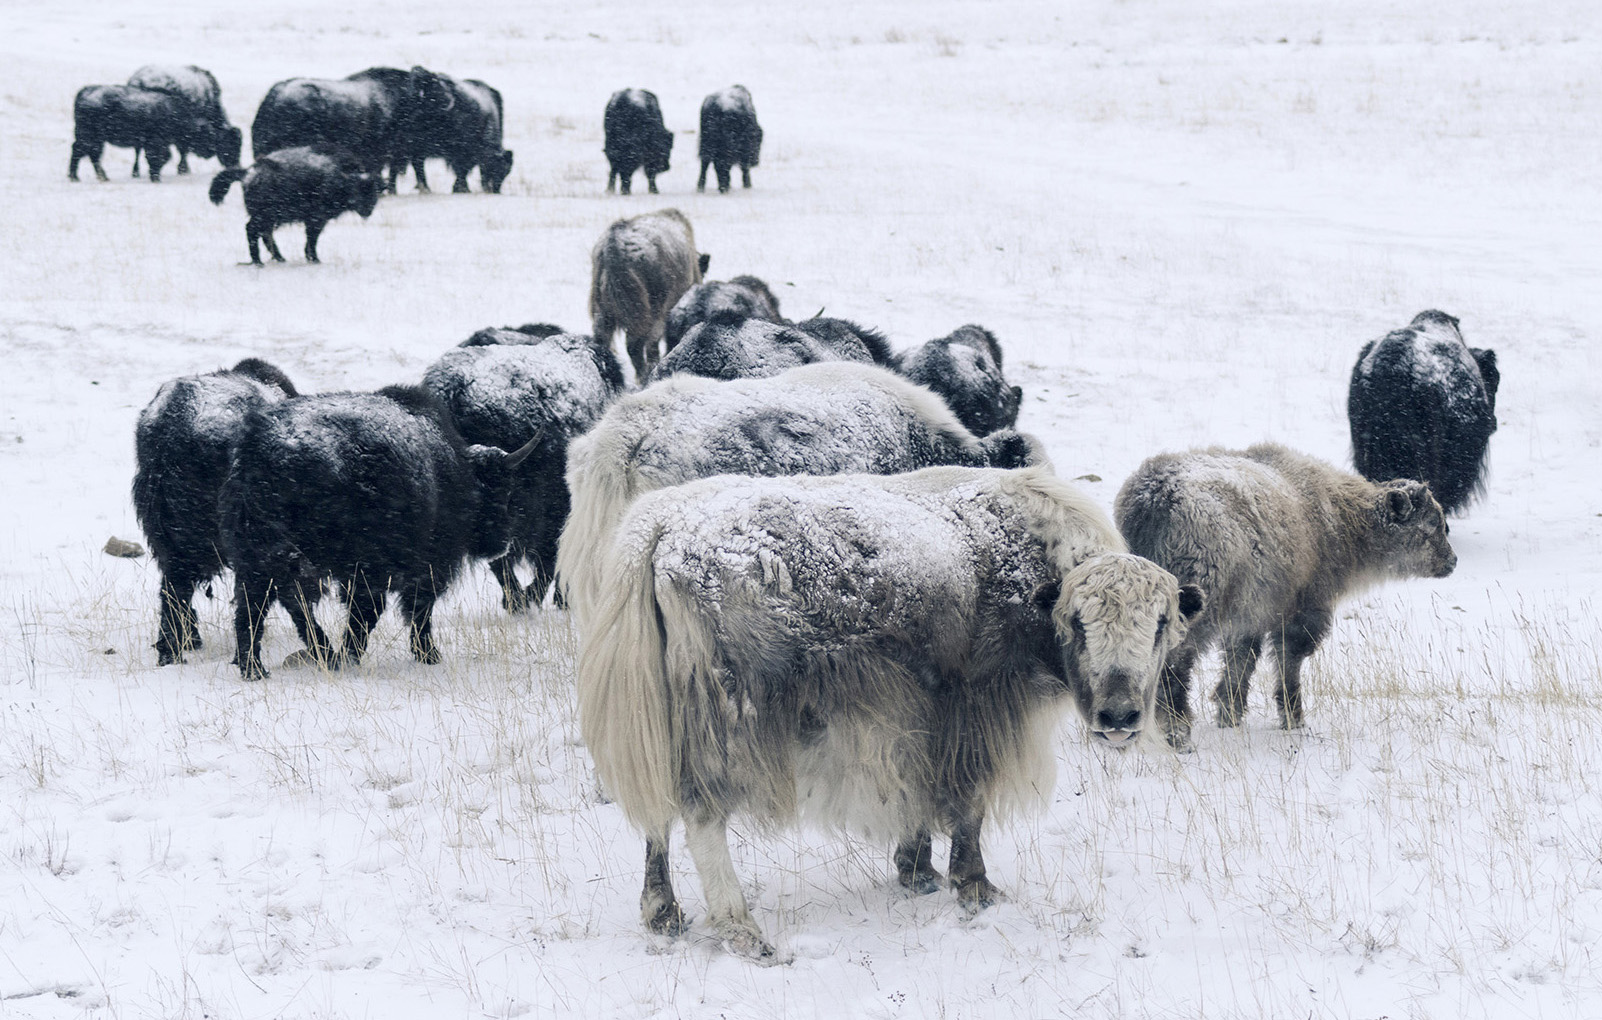 The Khangai region's microclimate contributes to the unique qualities of Khangai Yak coats.